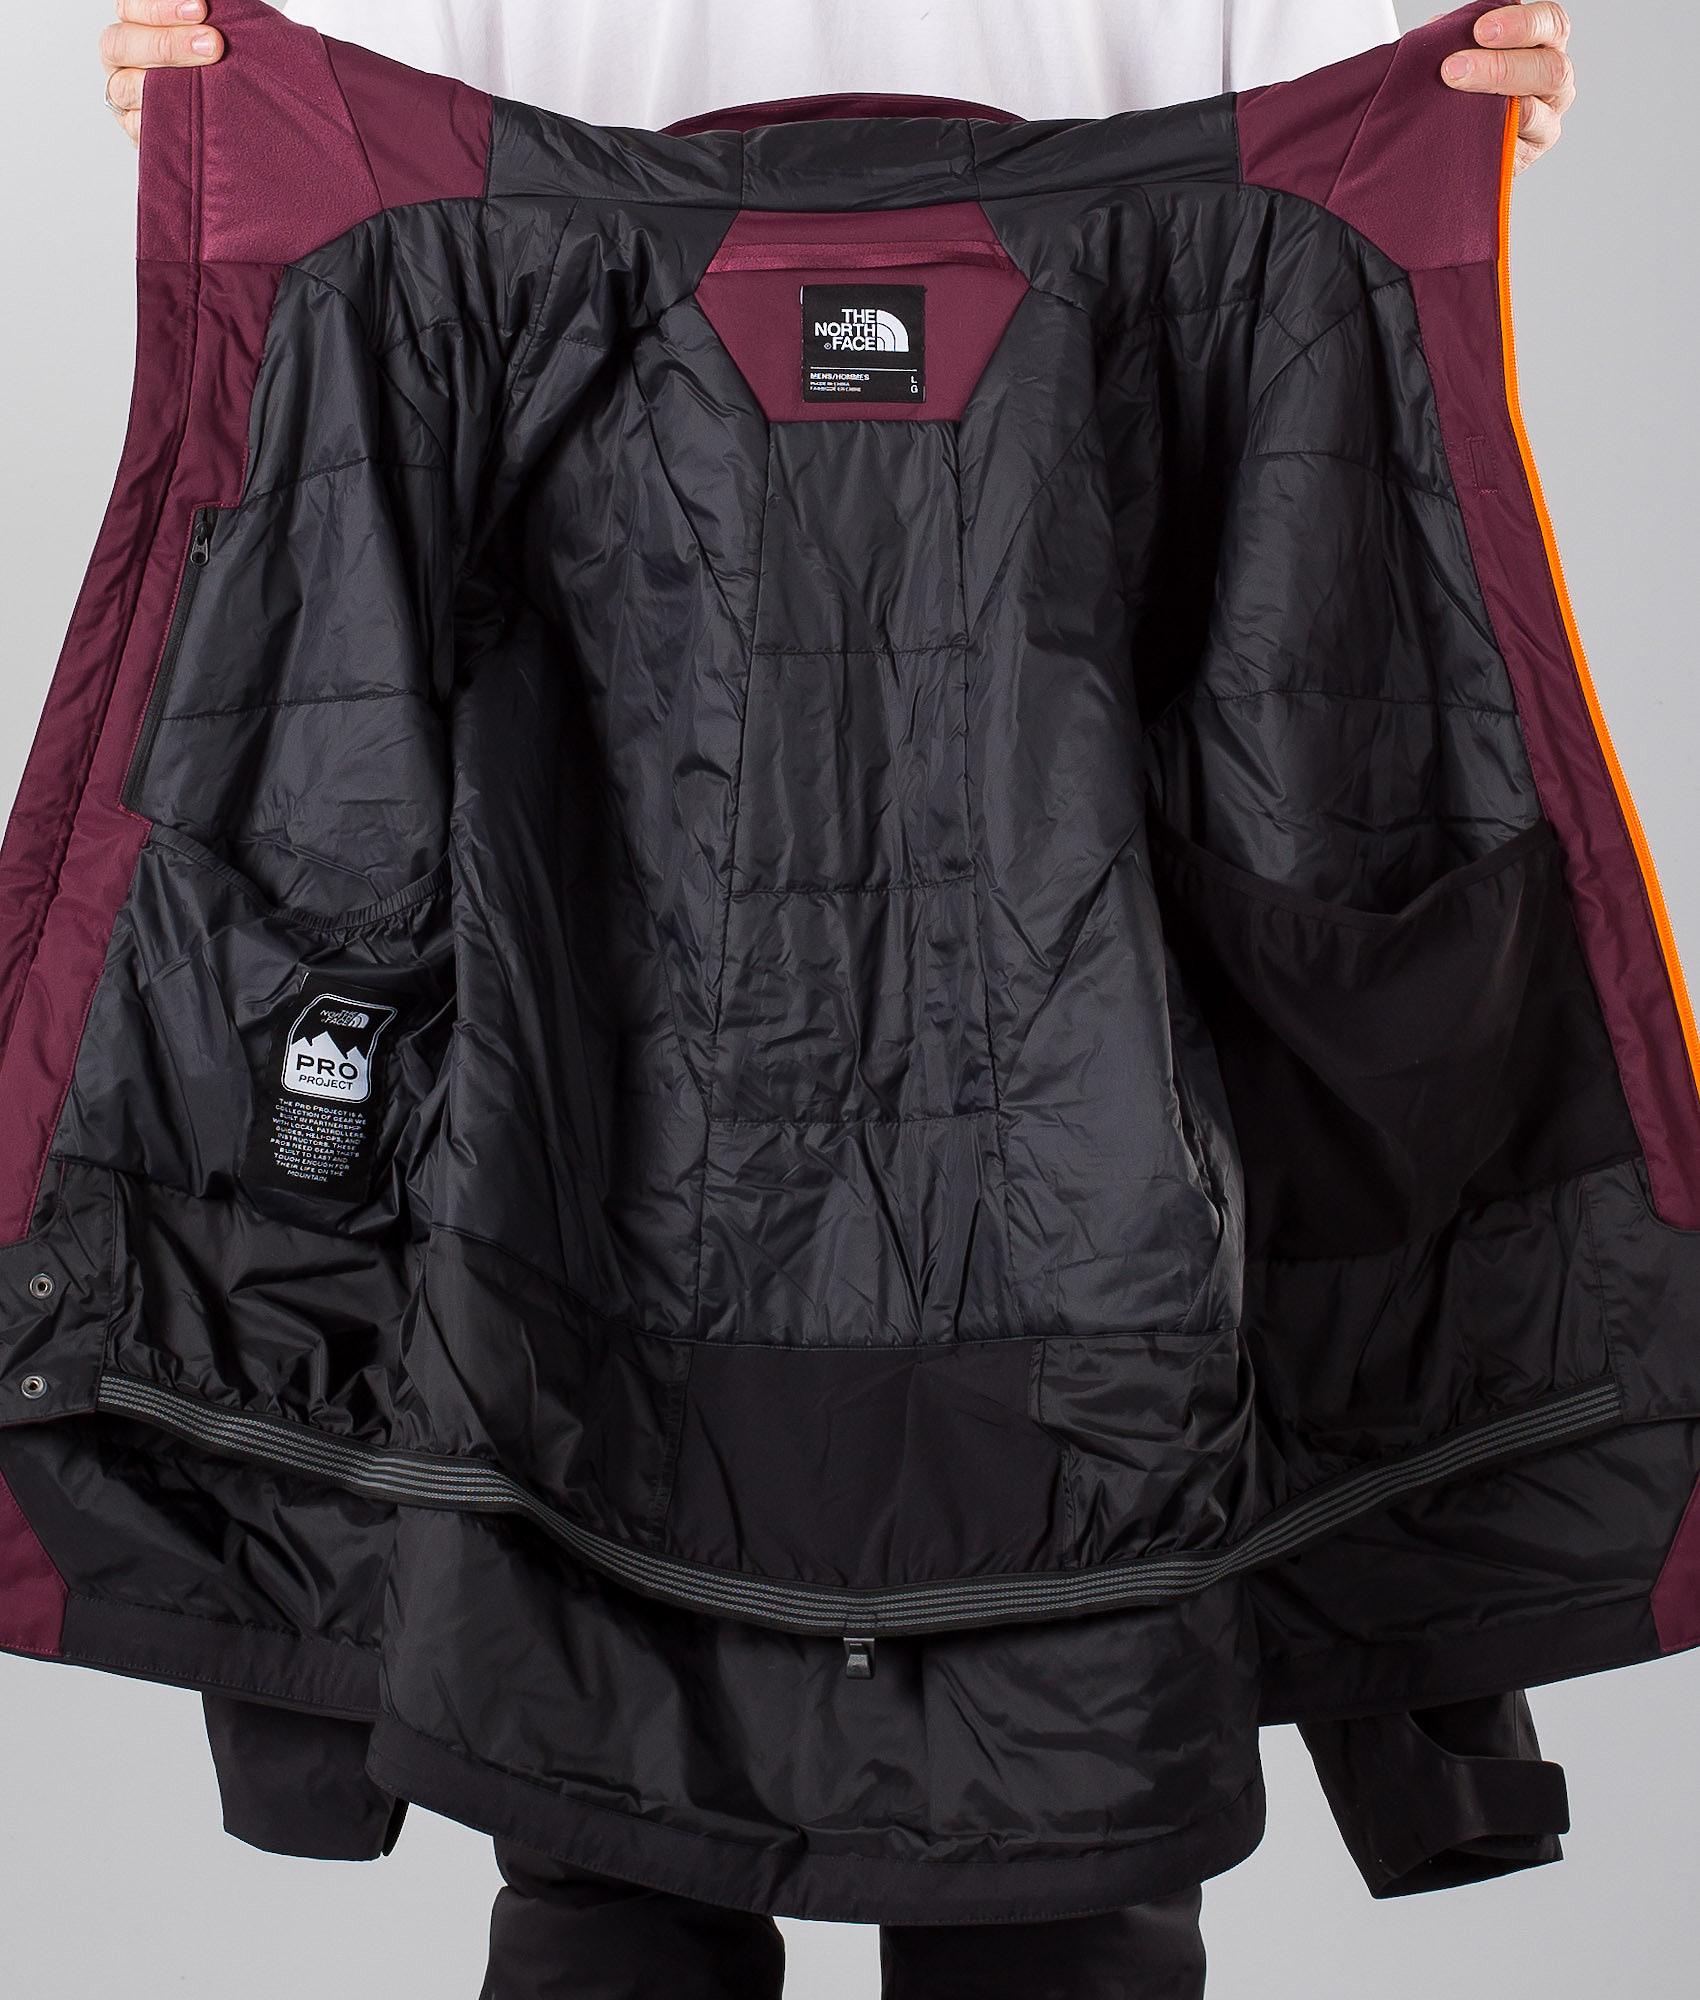 840906a0a1f7 The North Face Sickline Snowboard Jacket Fig Tnf Black - Ridestore.com